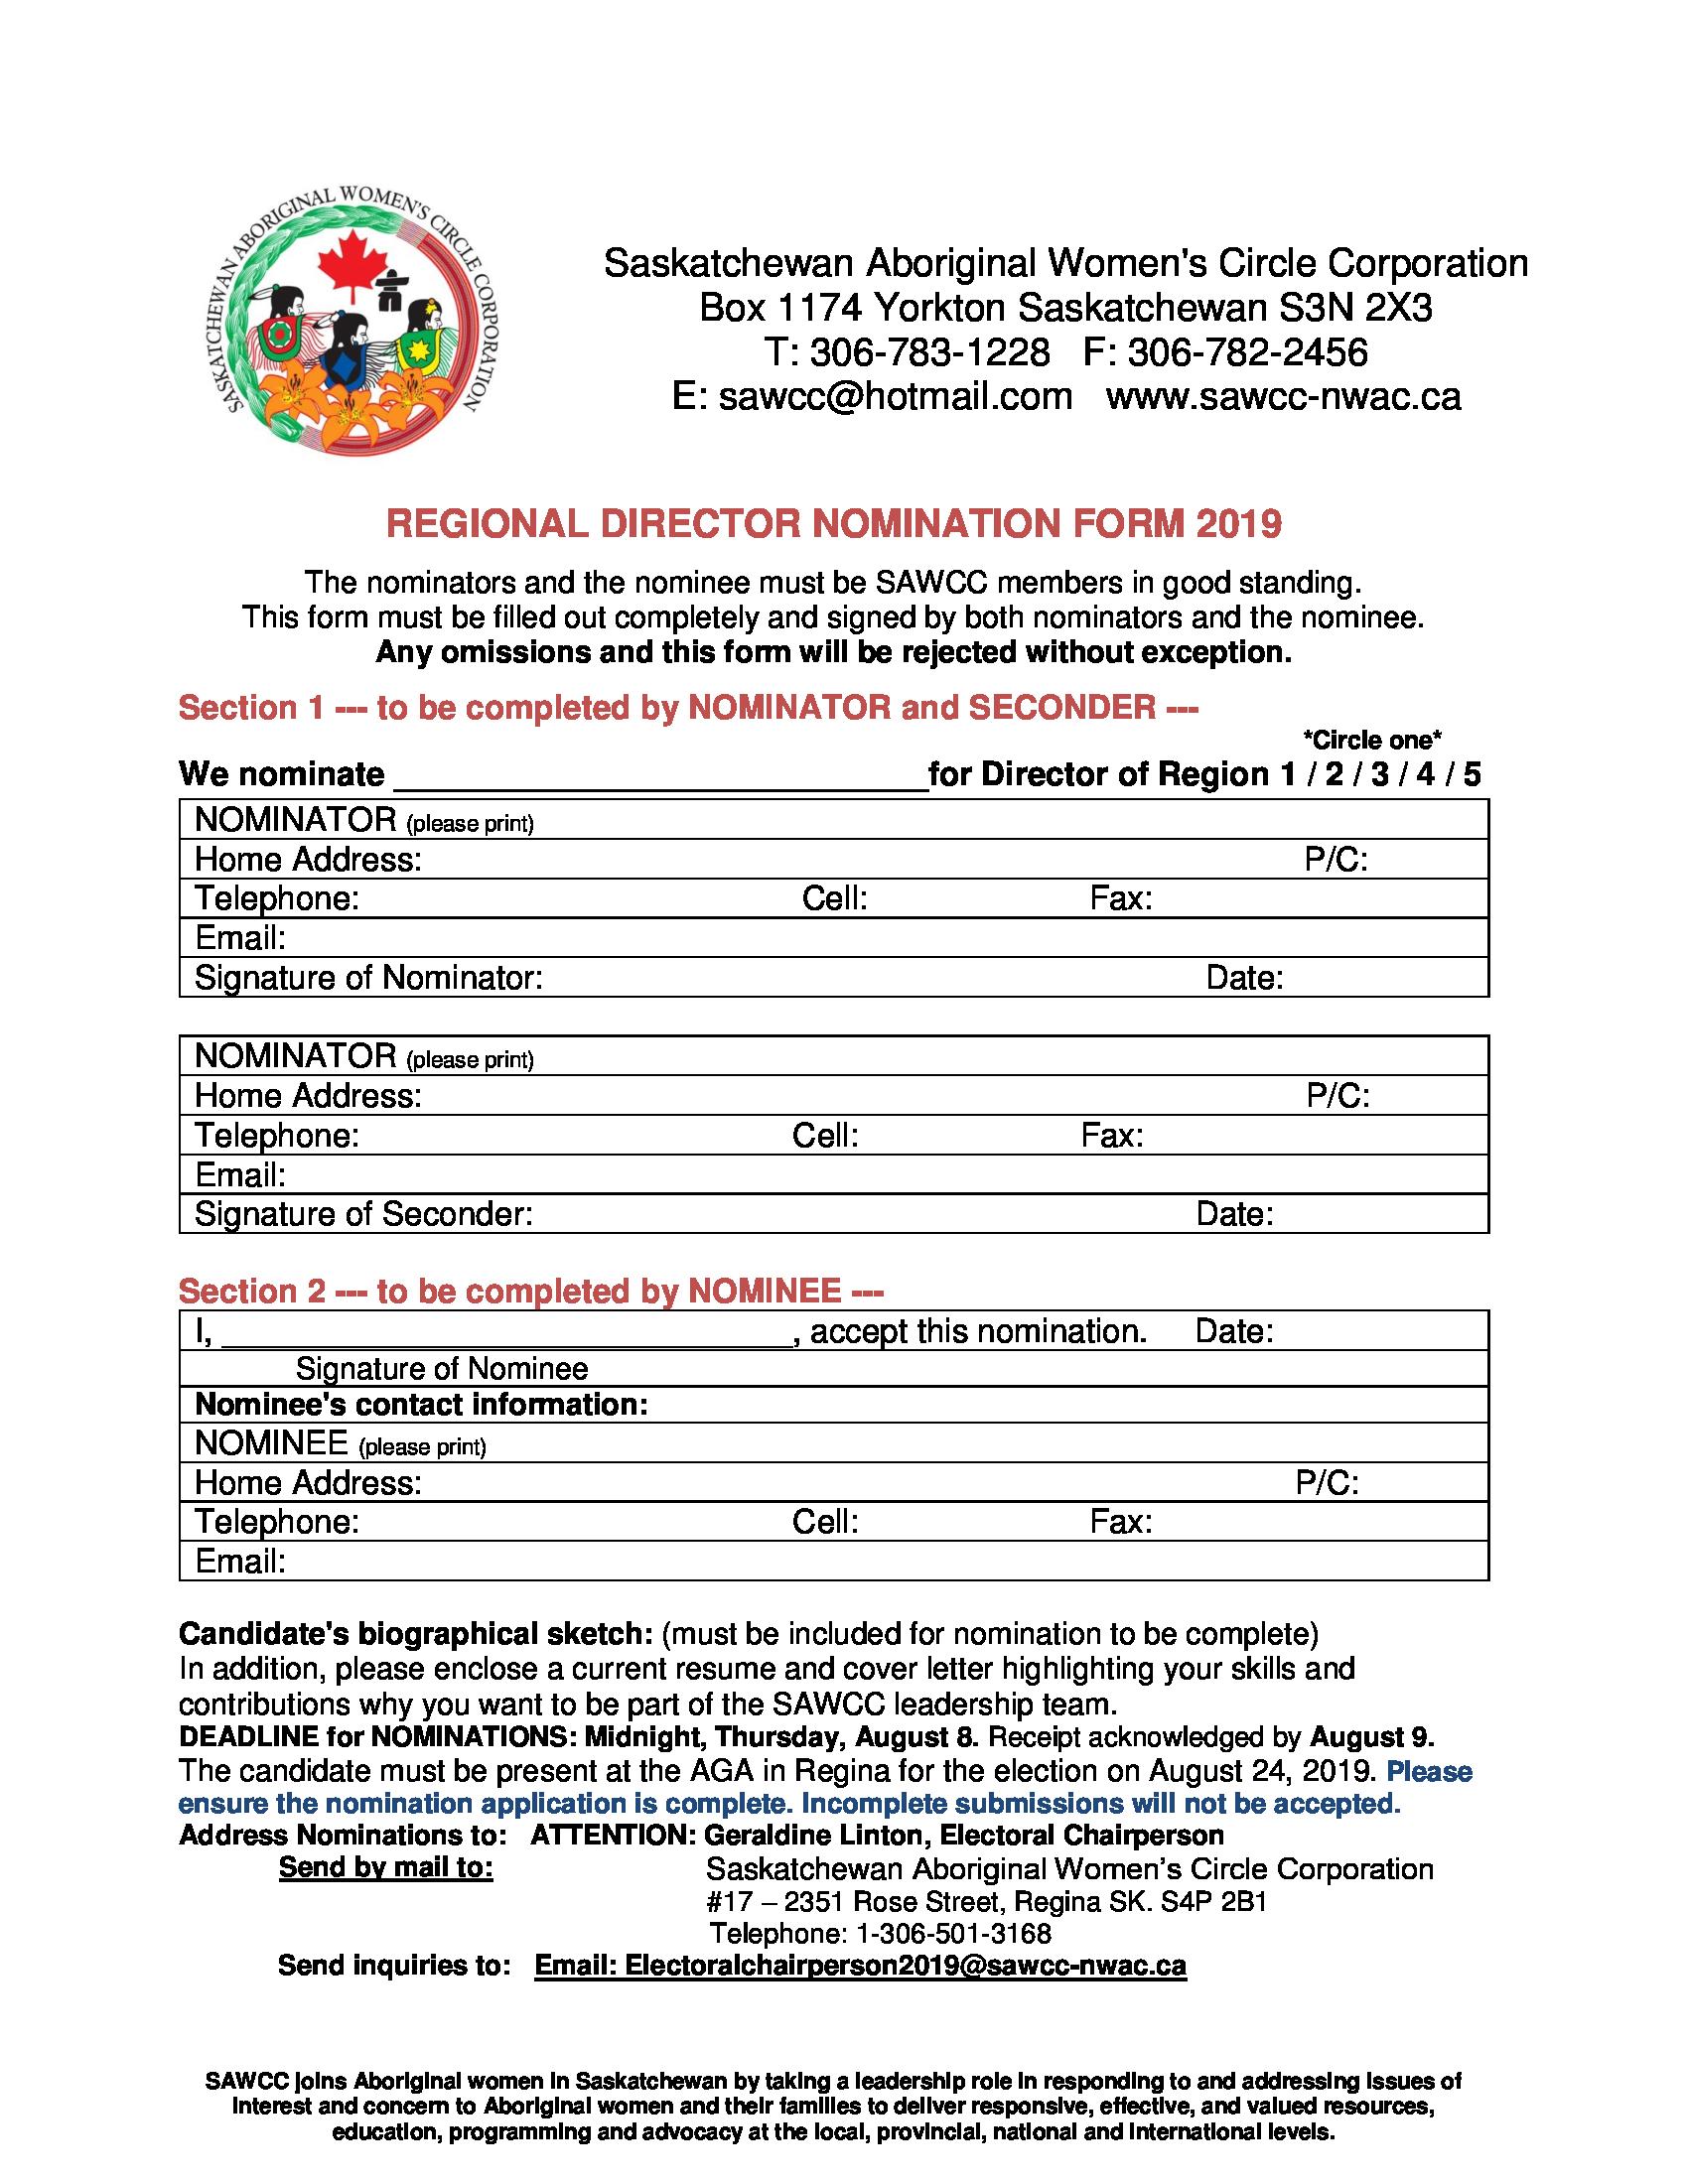 Regional Director Nomination Form -